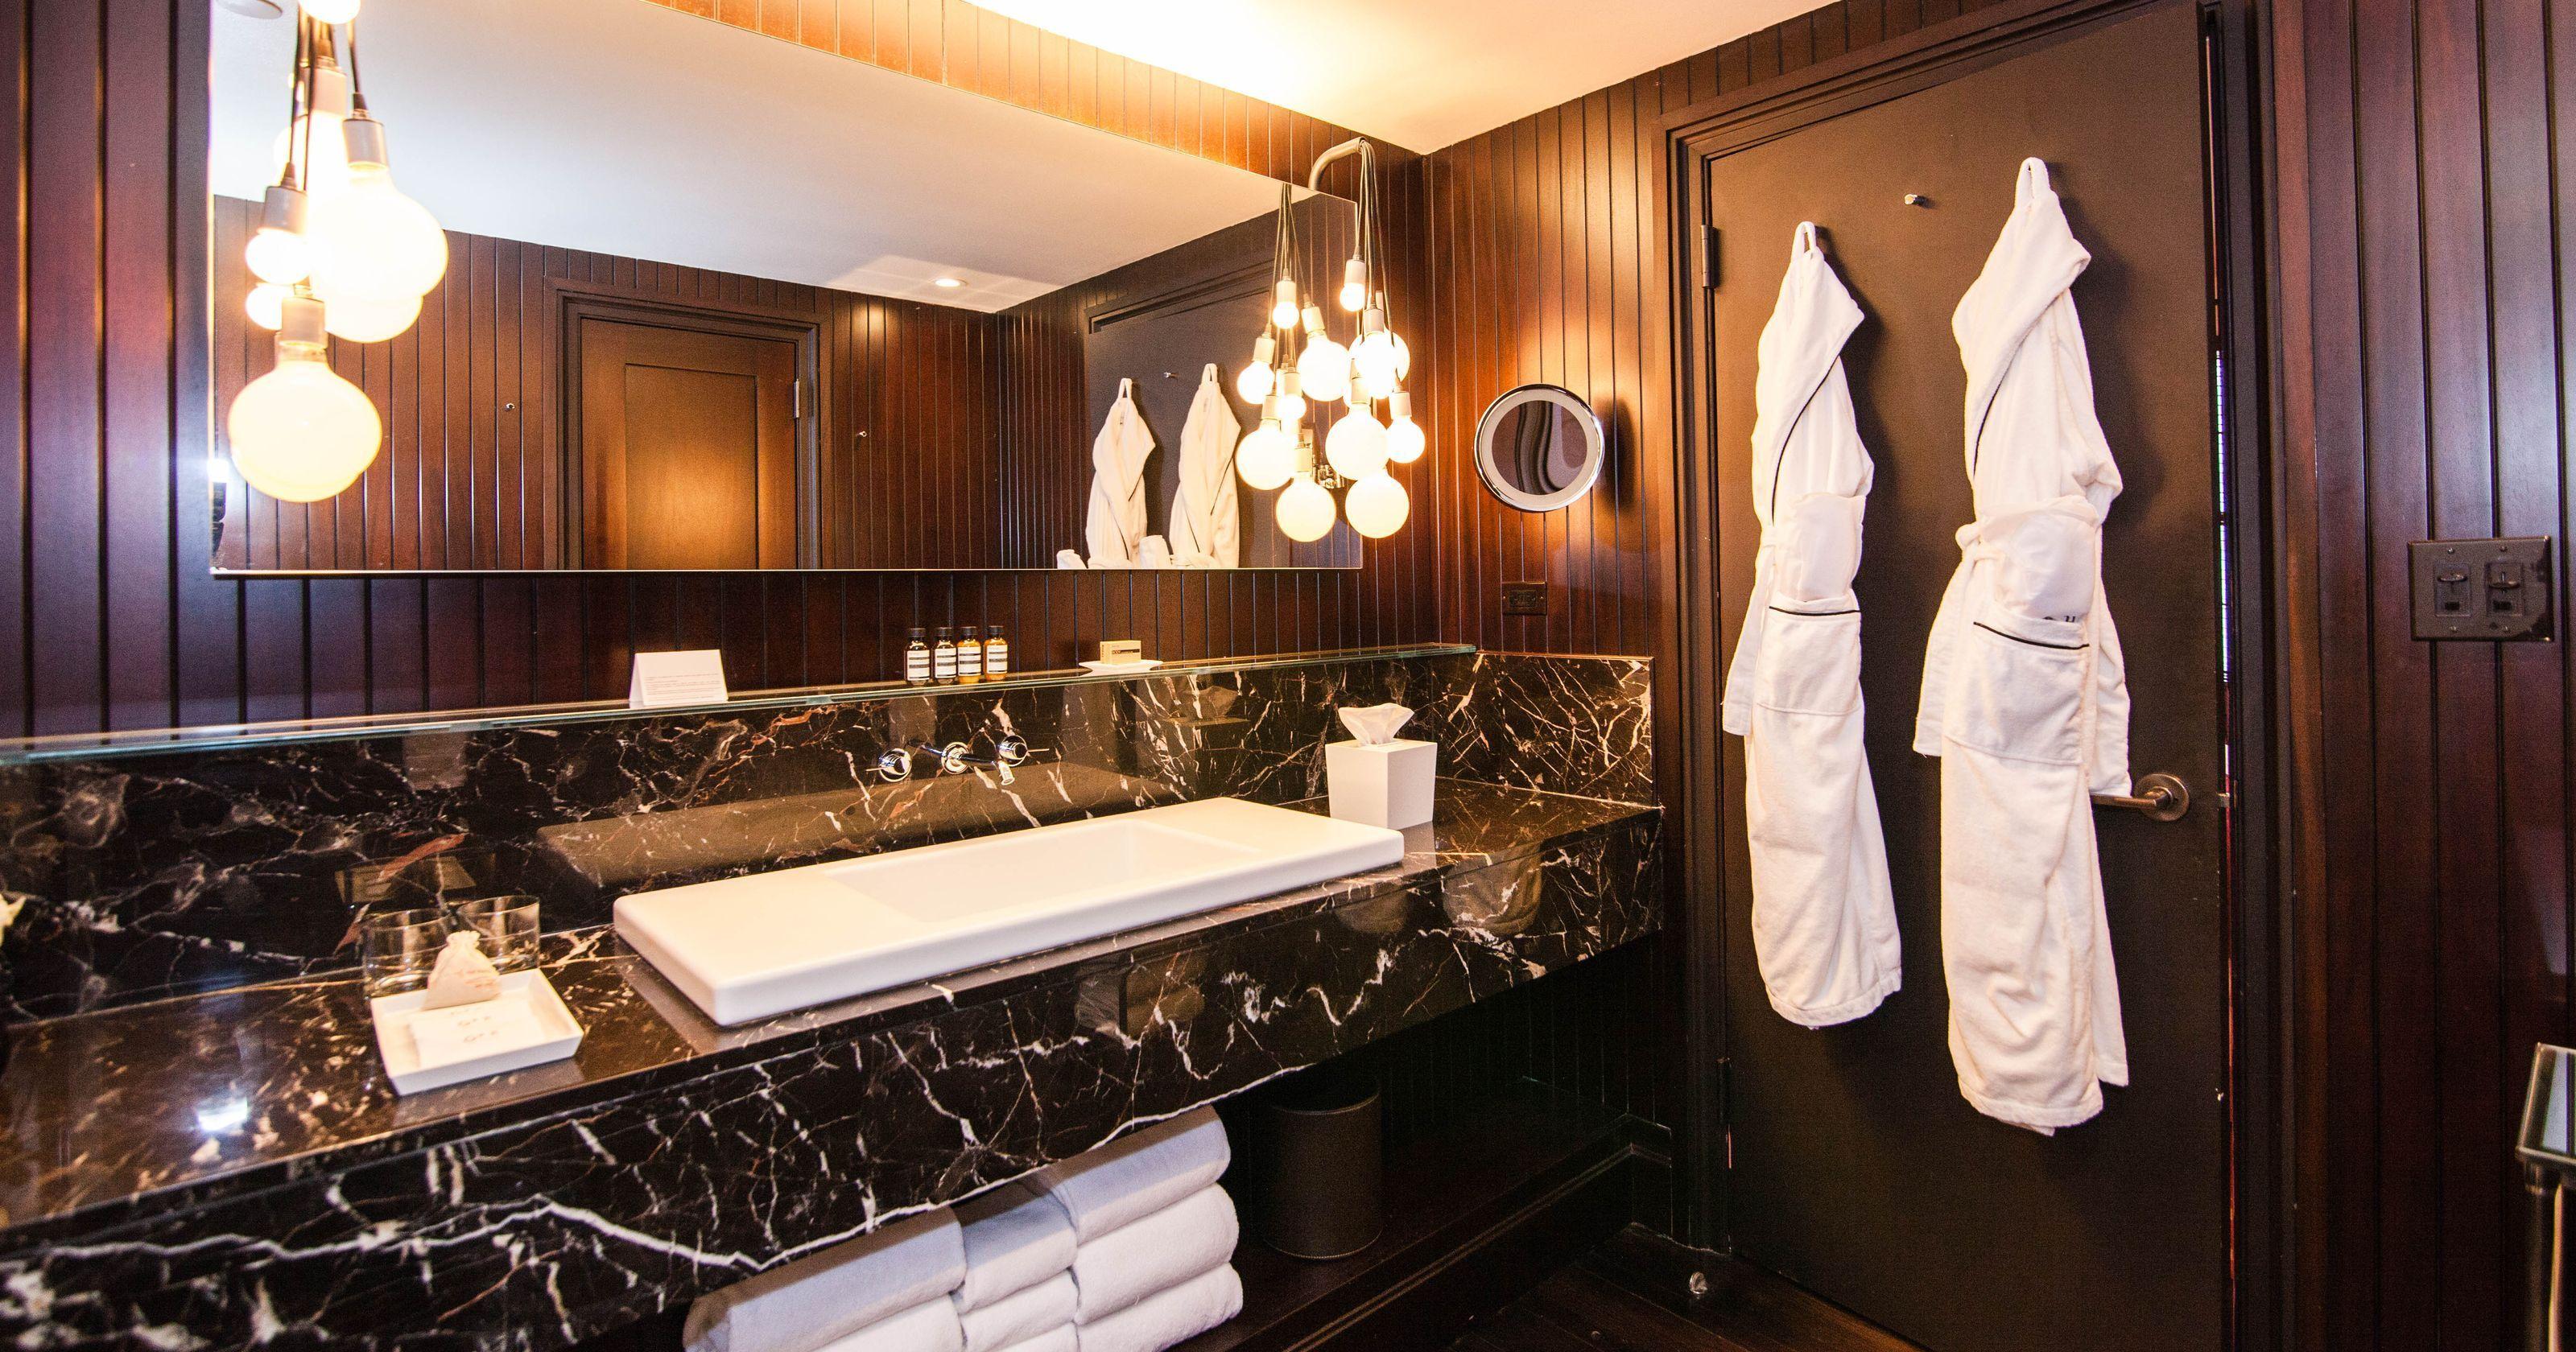 Americas Most Luxurious Hotel Bathrooms Bathrooms Pinterest Stunning Most Luxurious